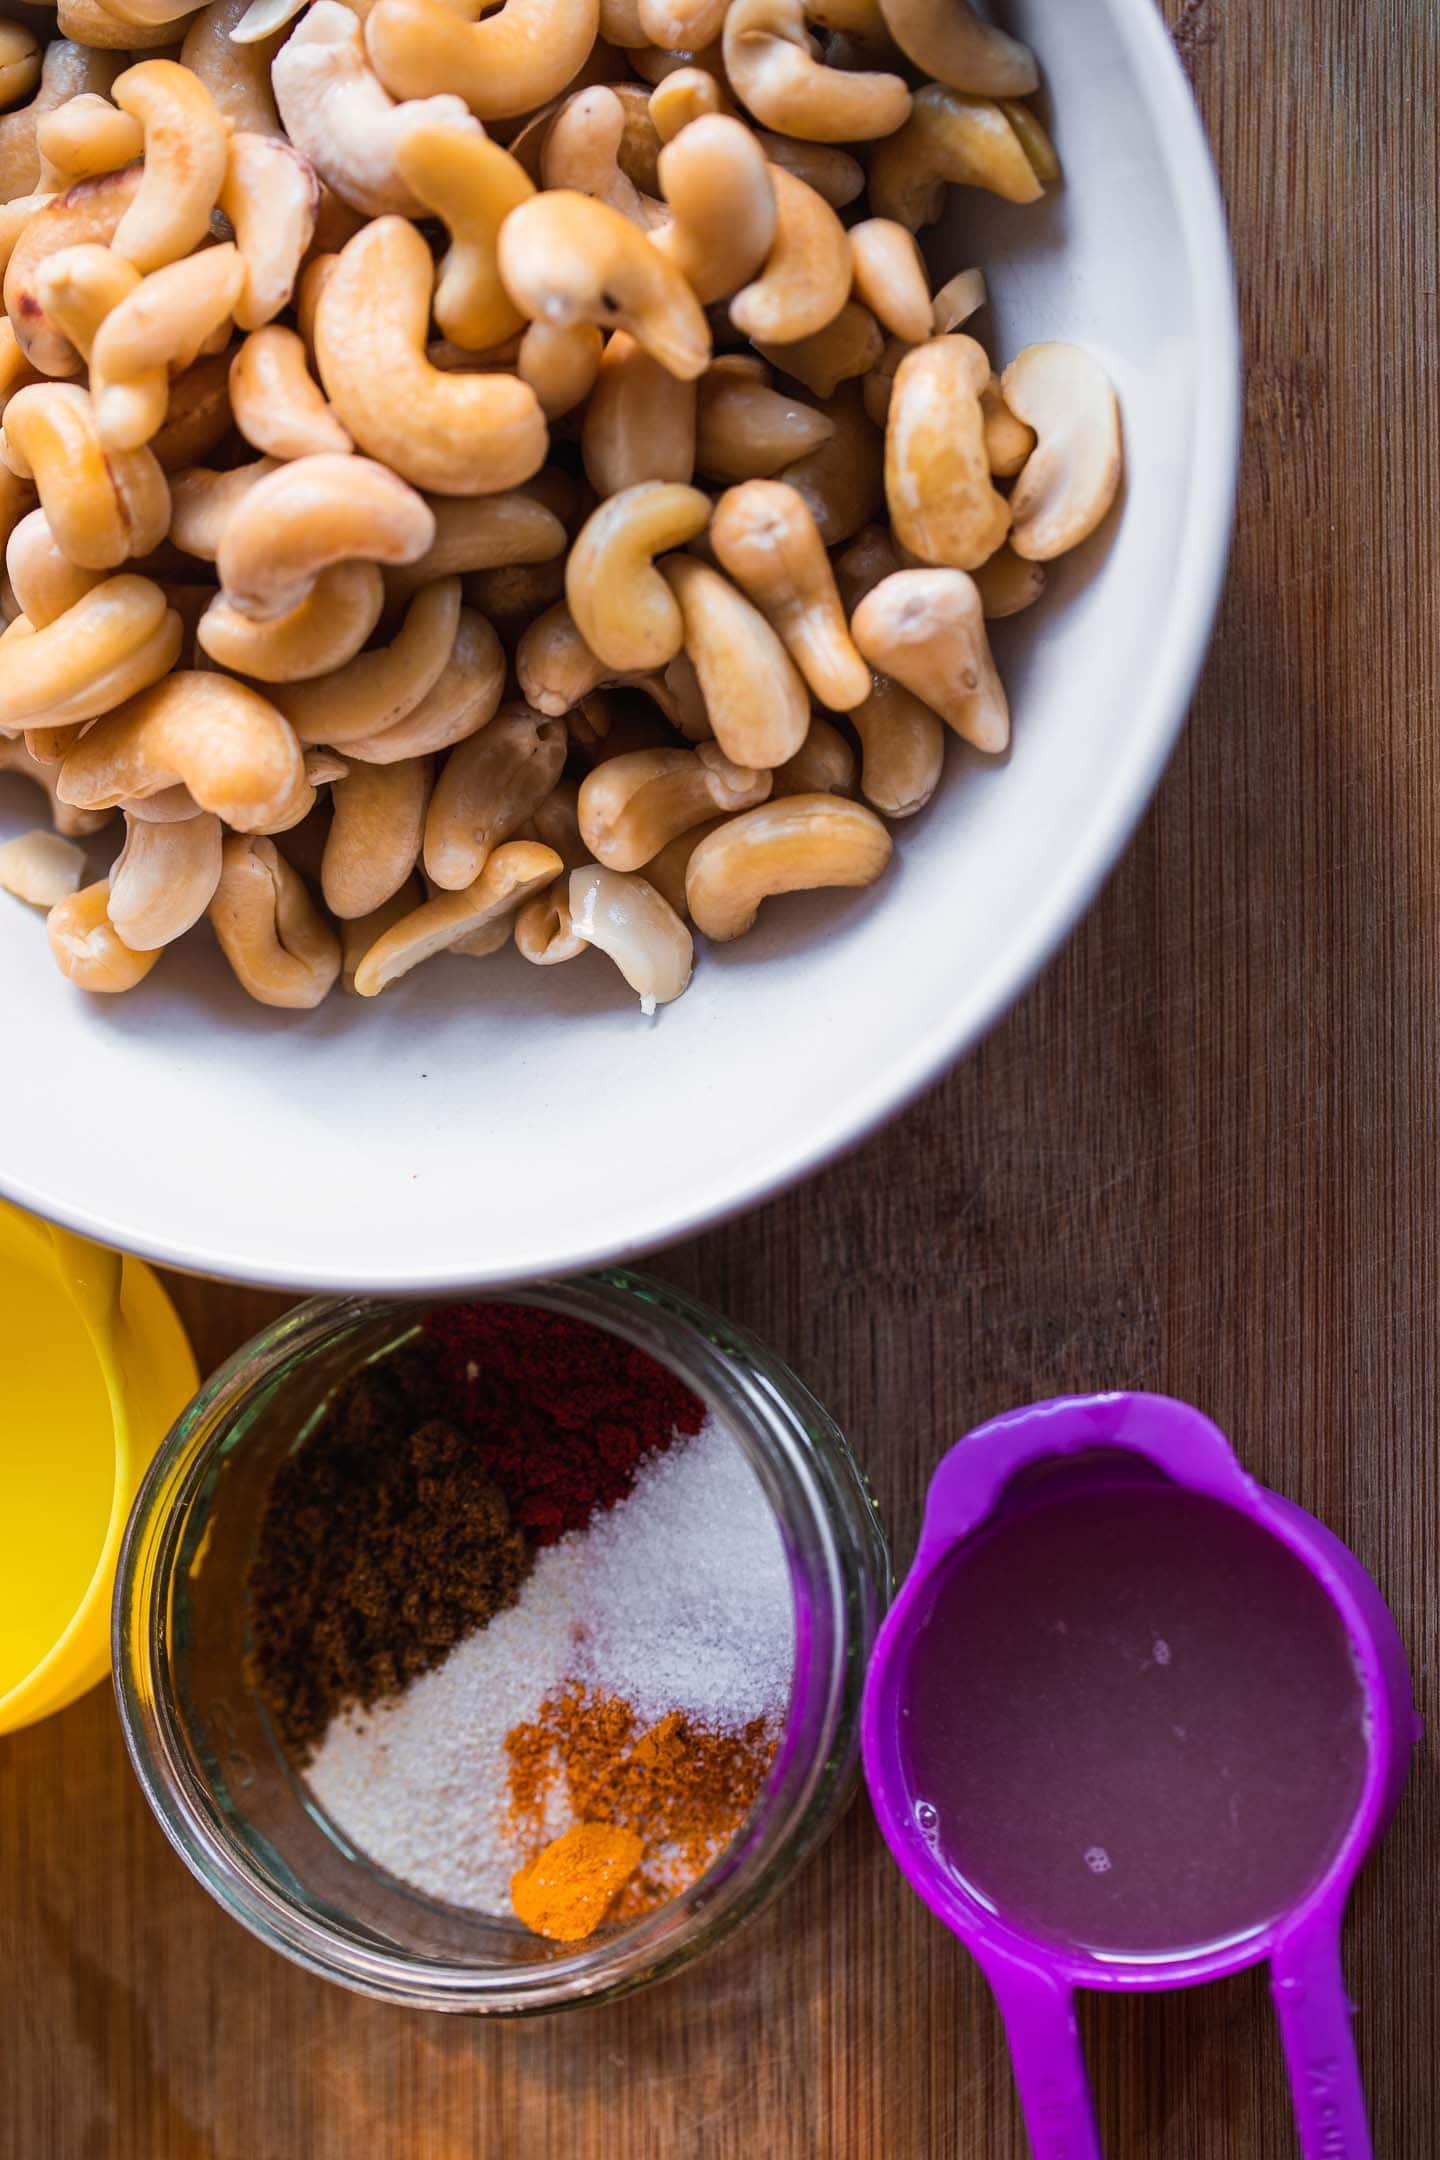 Ingredients for sliceable vegan cashew cheese